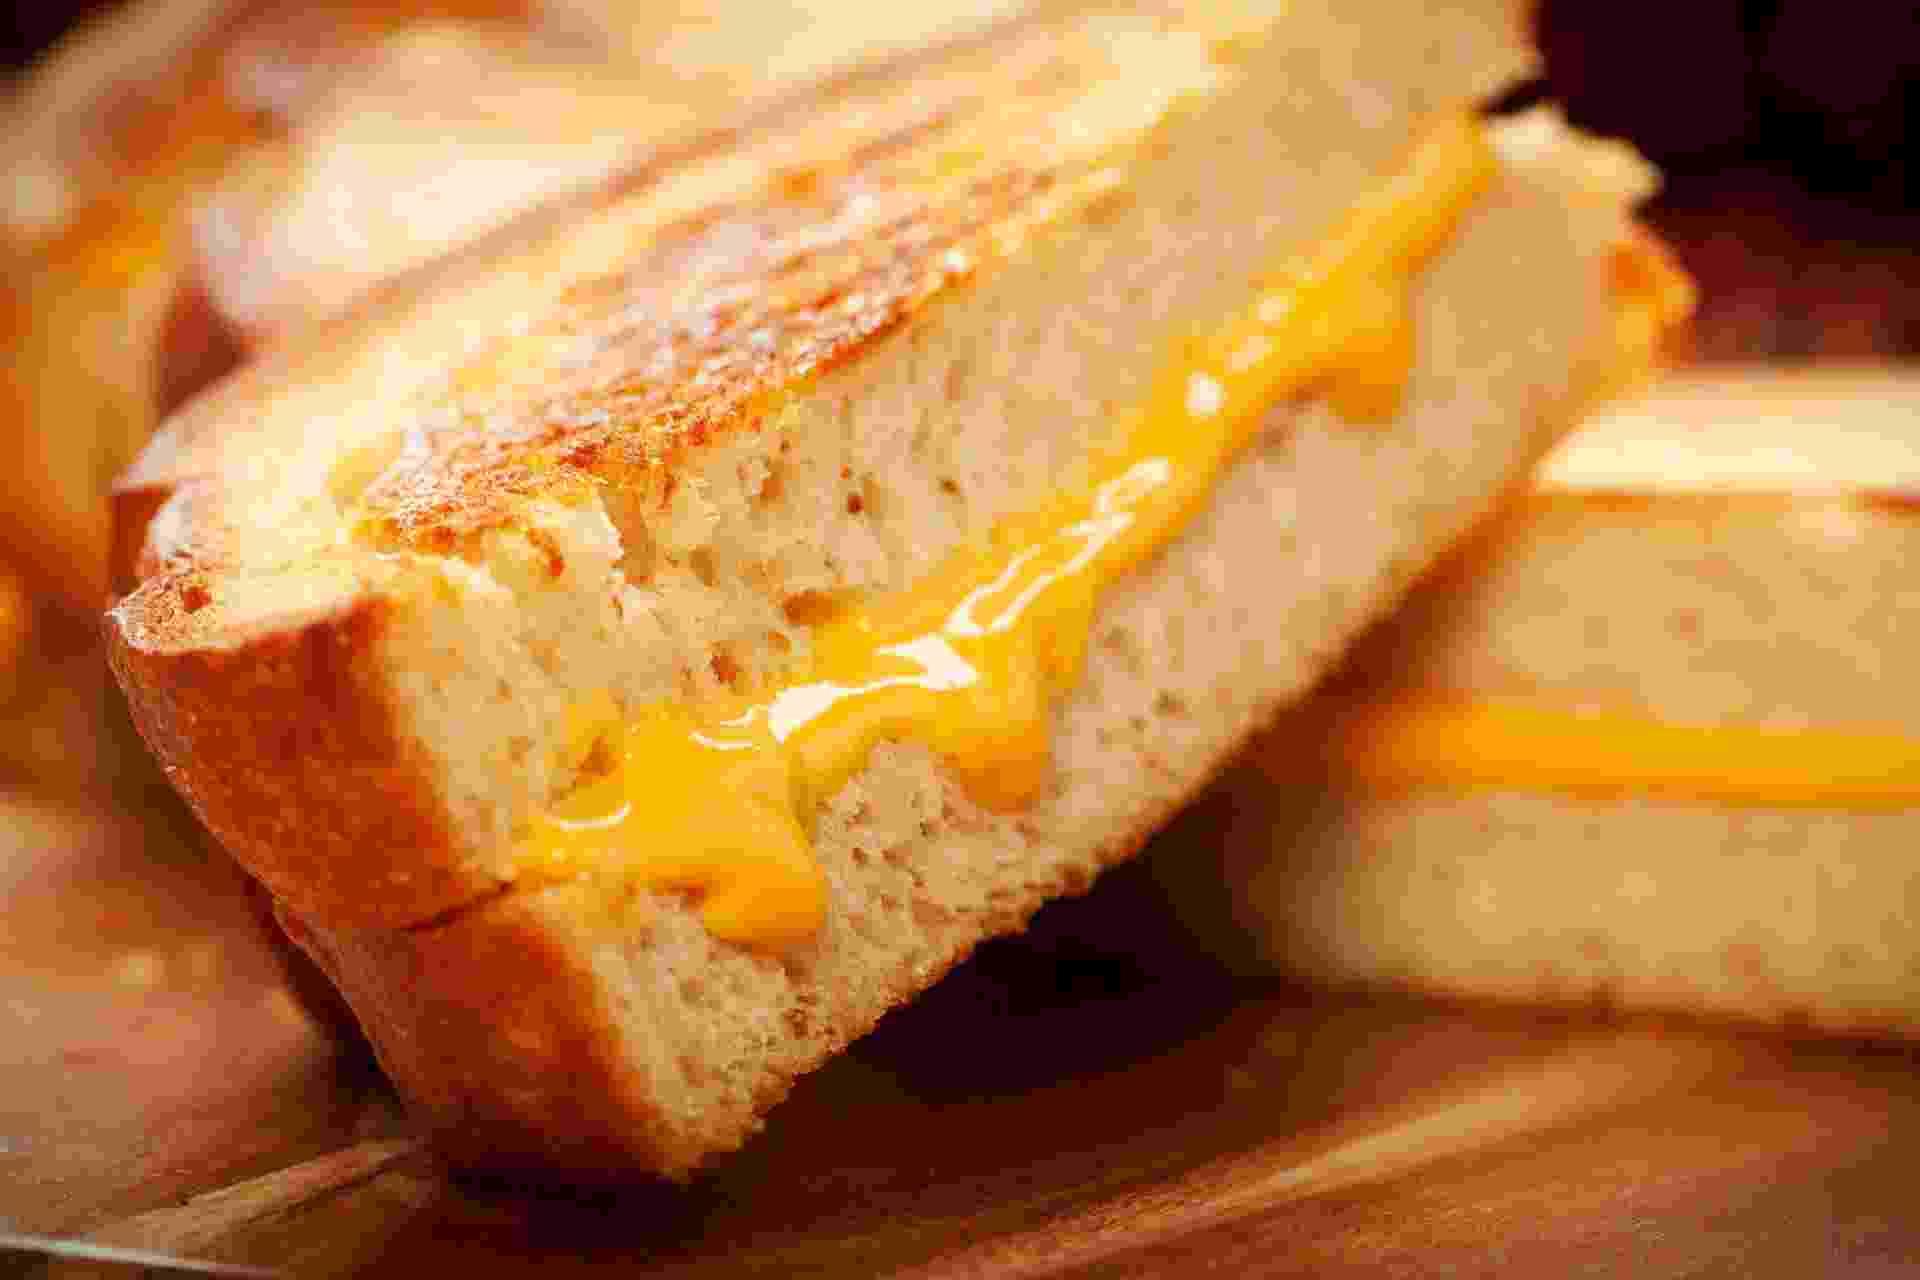 28.ago.2013 - queijo quente perfeito - Getty Images/iStockphoto